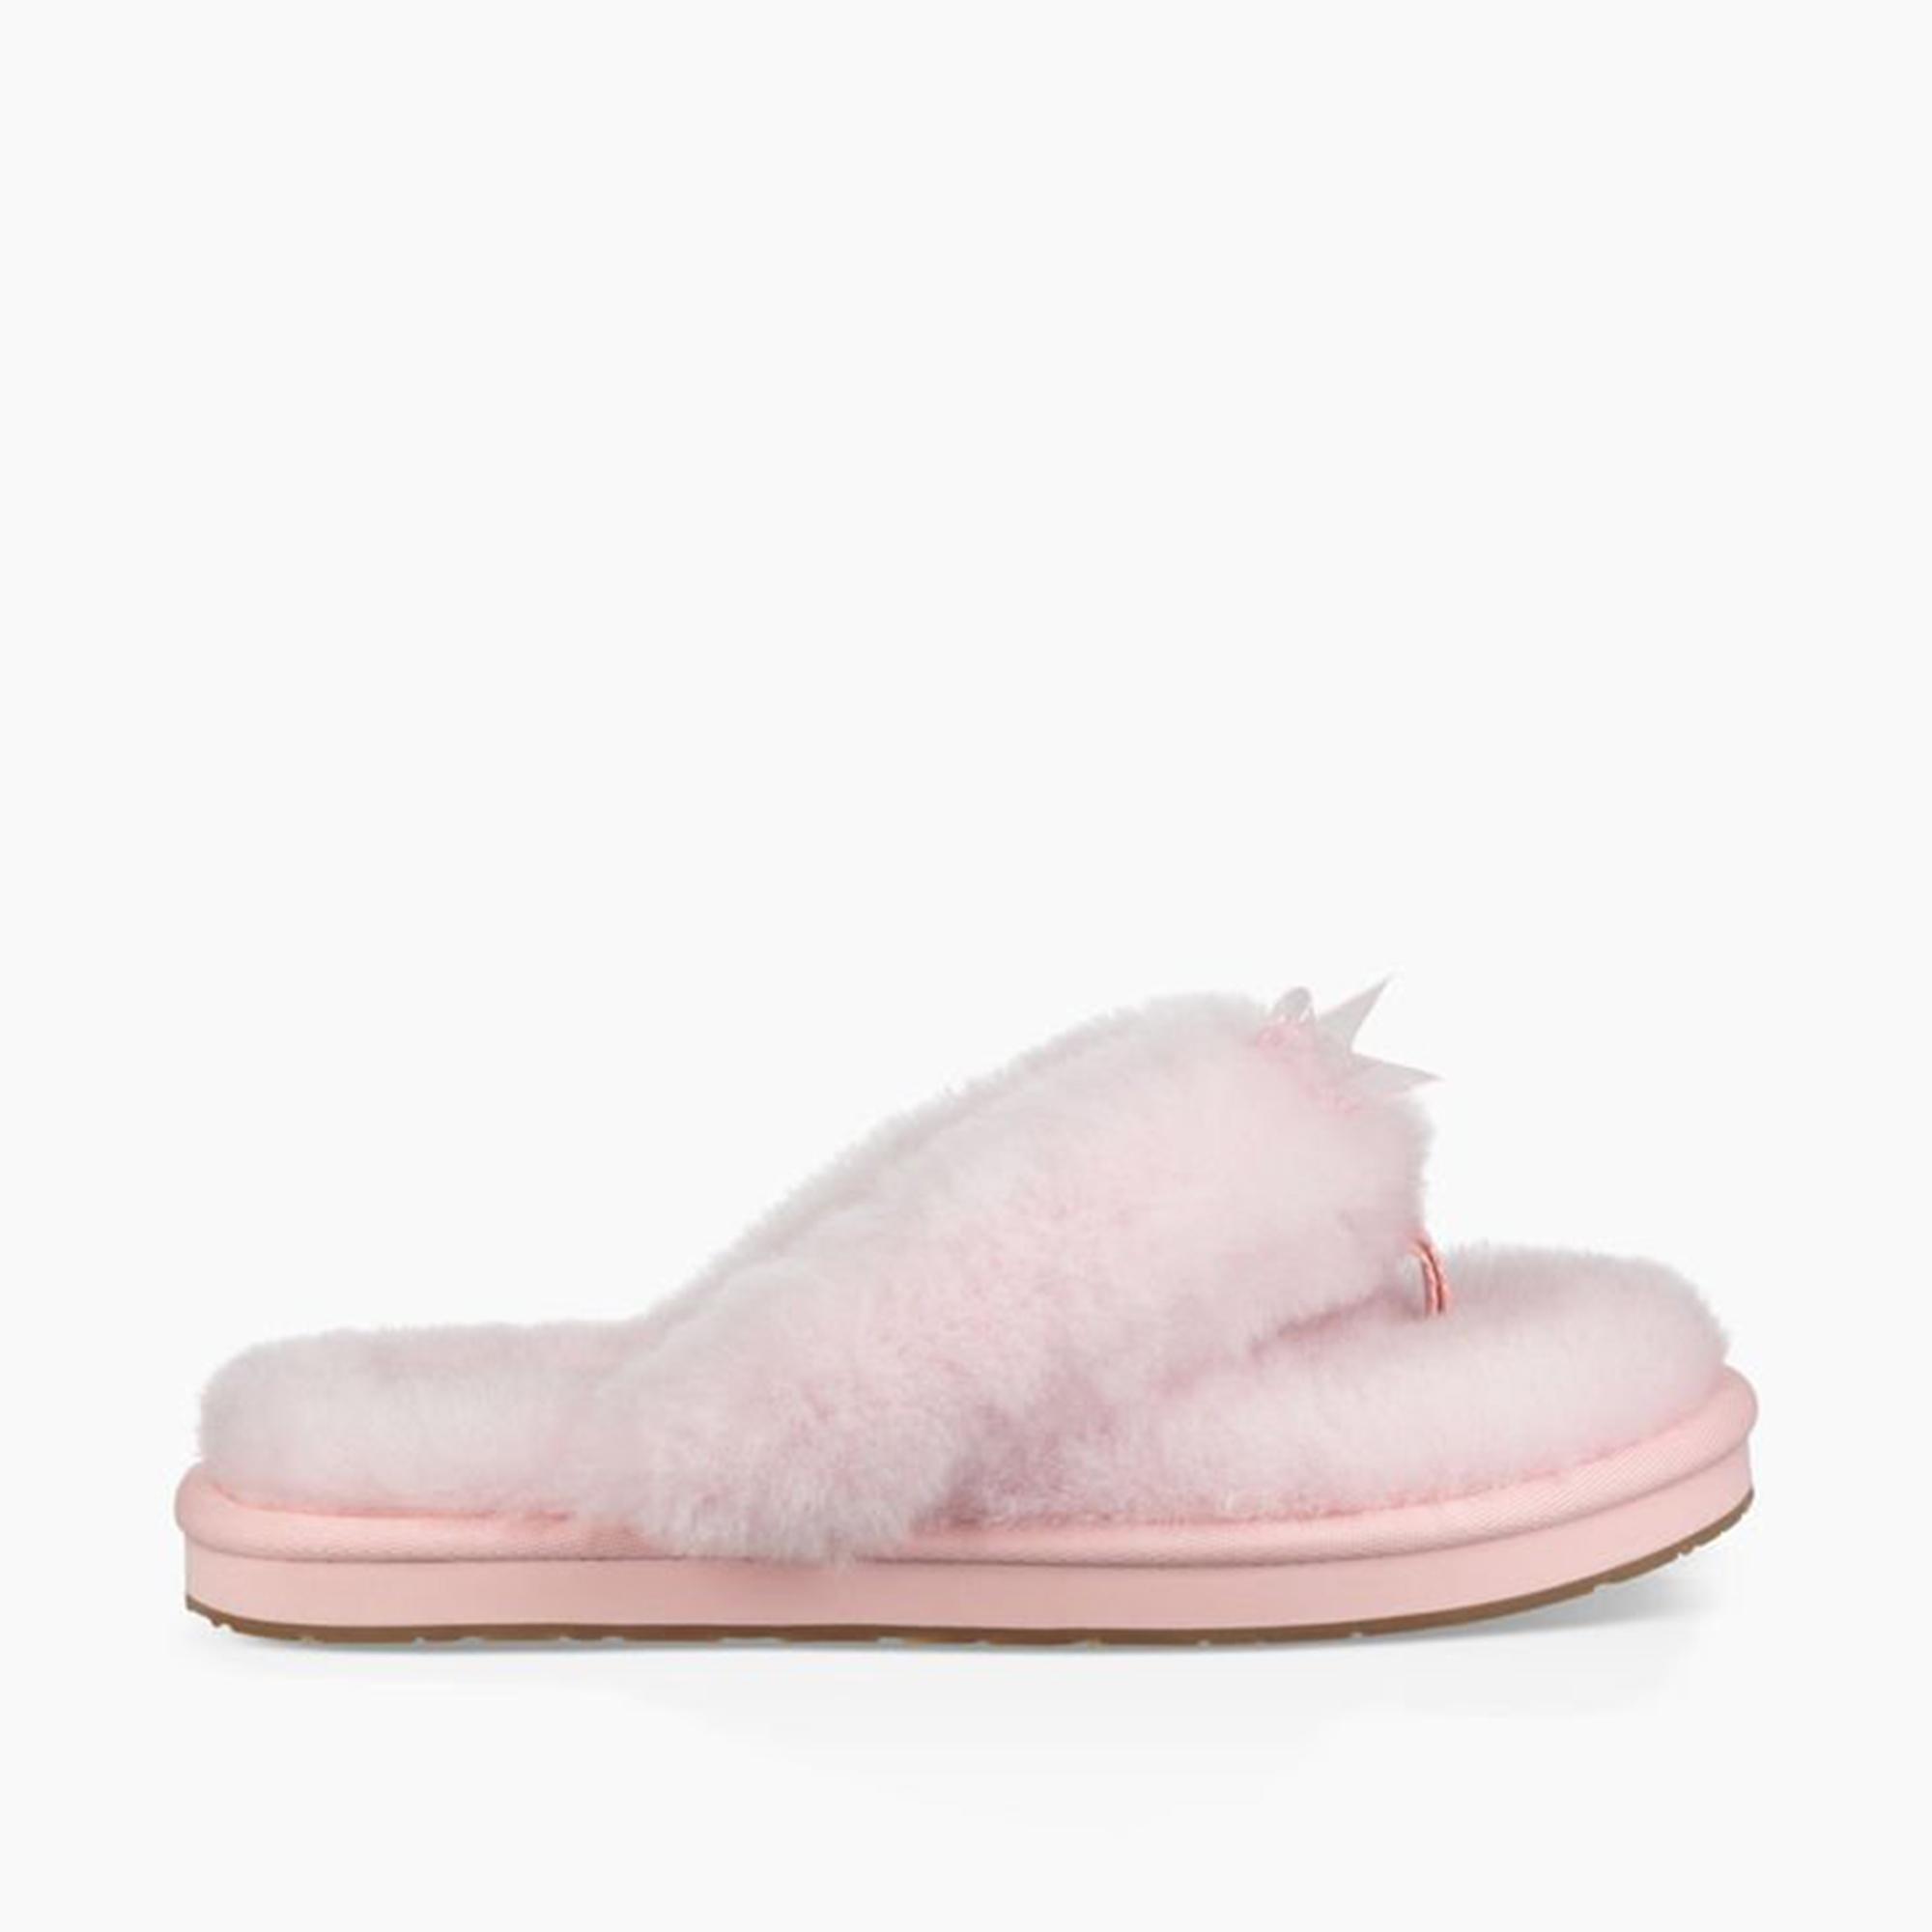 4c5f88d7dba UGG FLUFF FLIP FLOP III Ladies Toe Post Slippers Seashell Pink